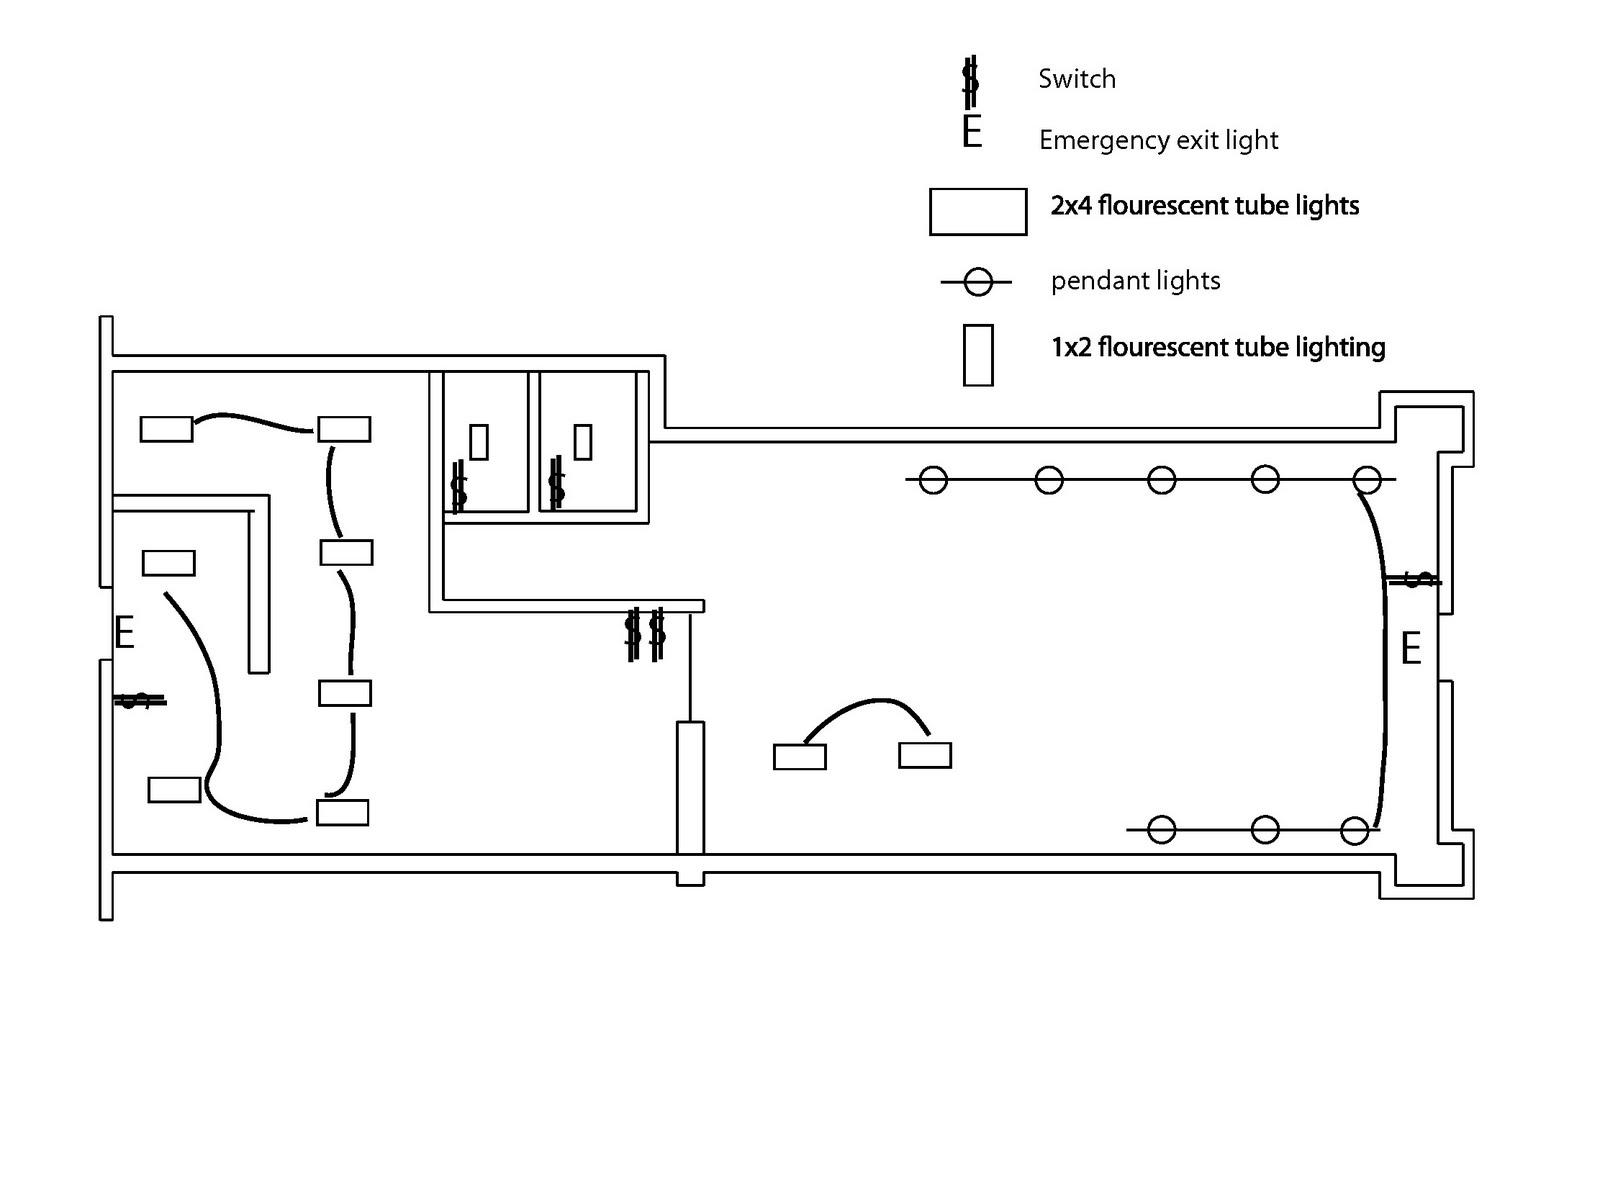 1970 Dodge Dart Ignition Wiring Diagram 1995 Ram 3500 Roadrunner Engine Imageresizertool Com